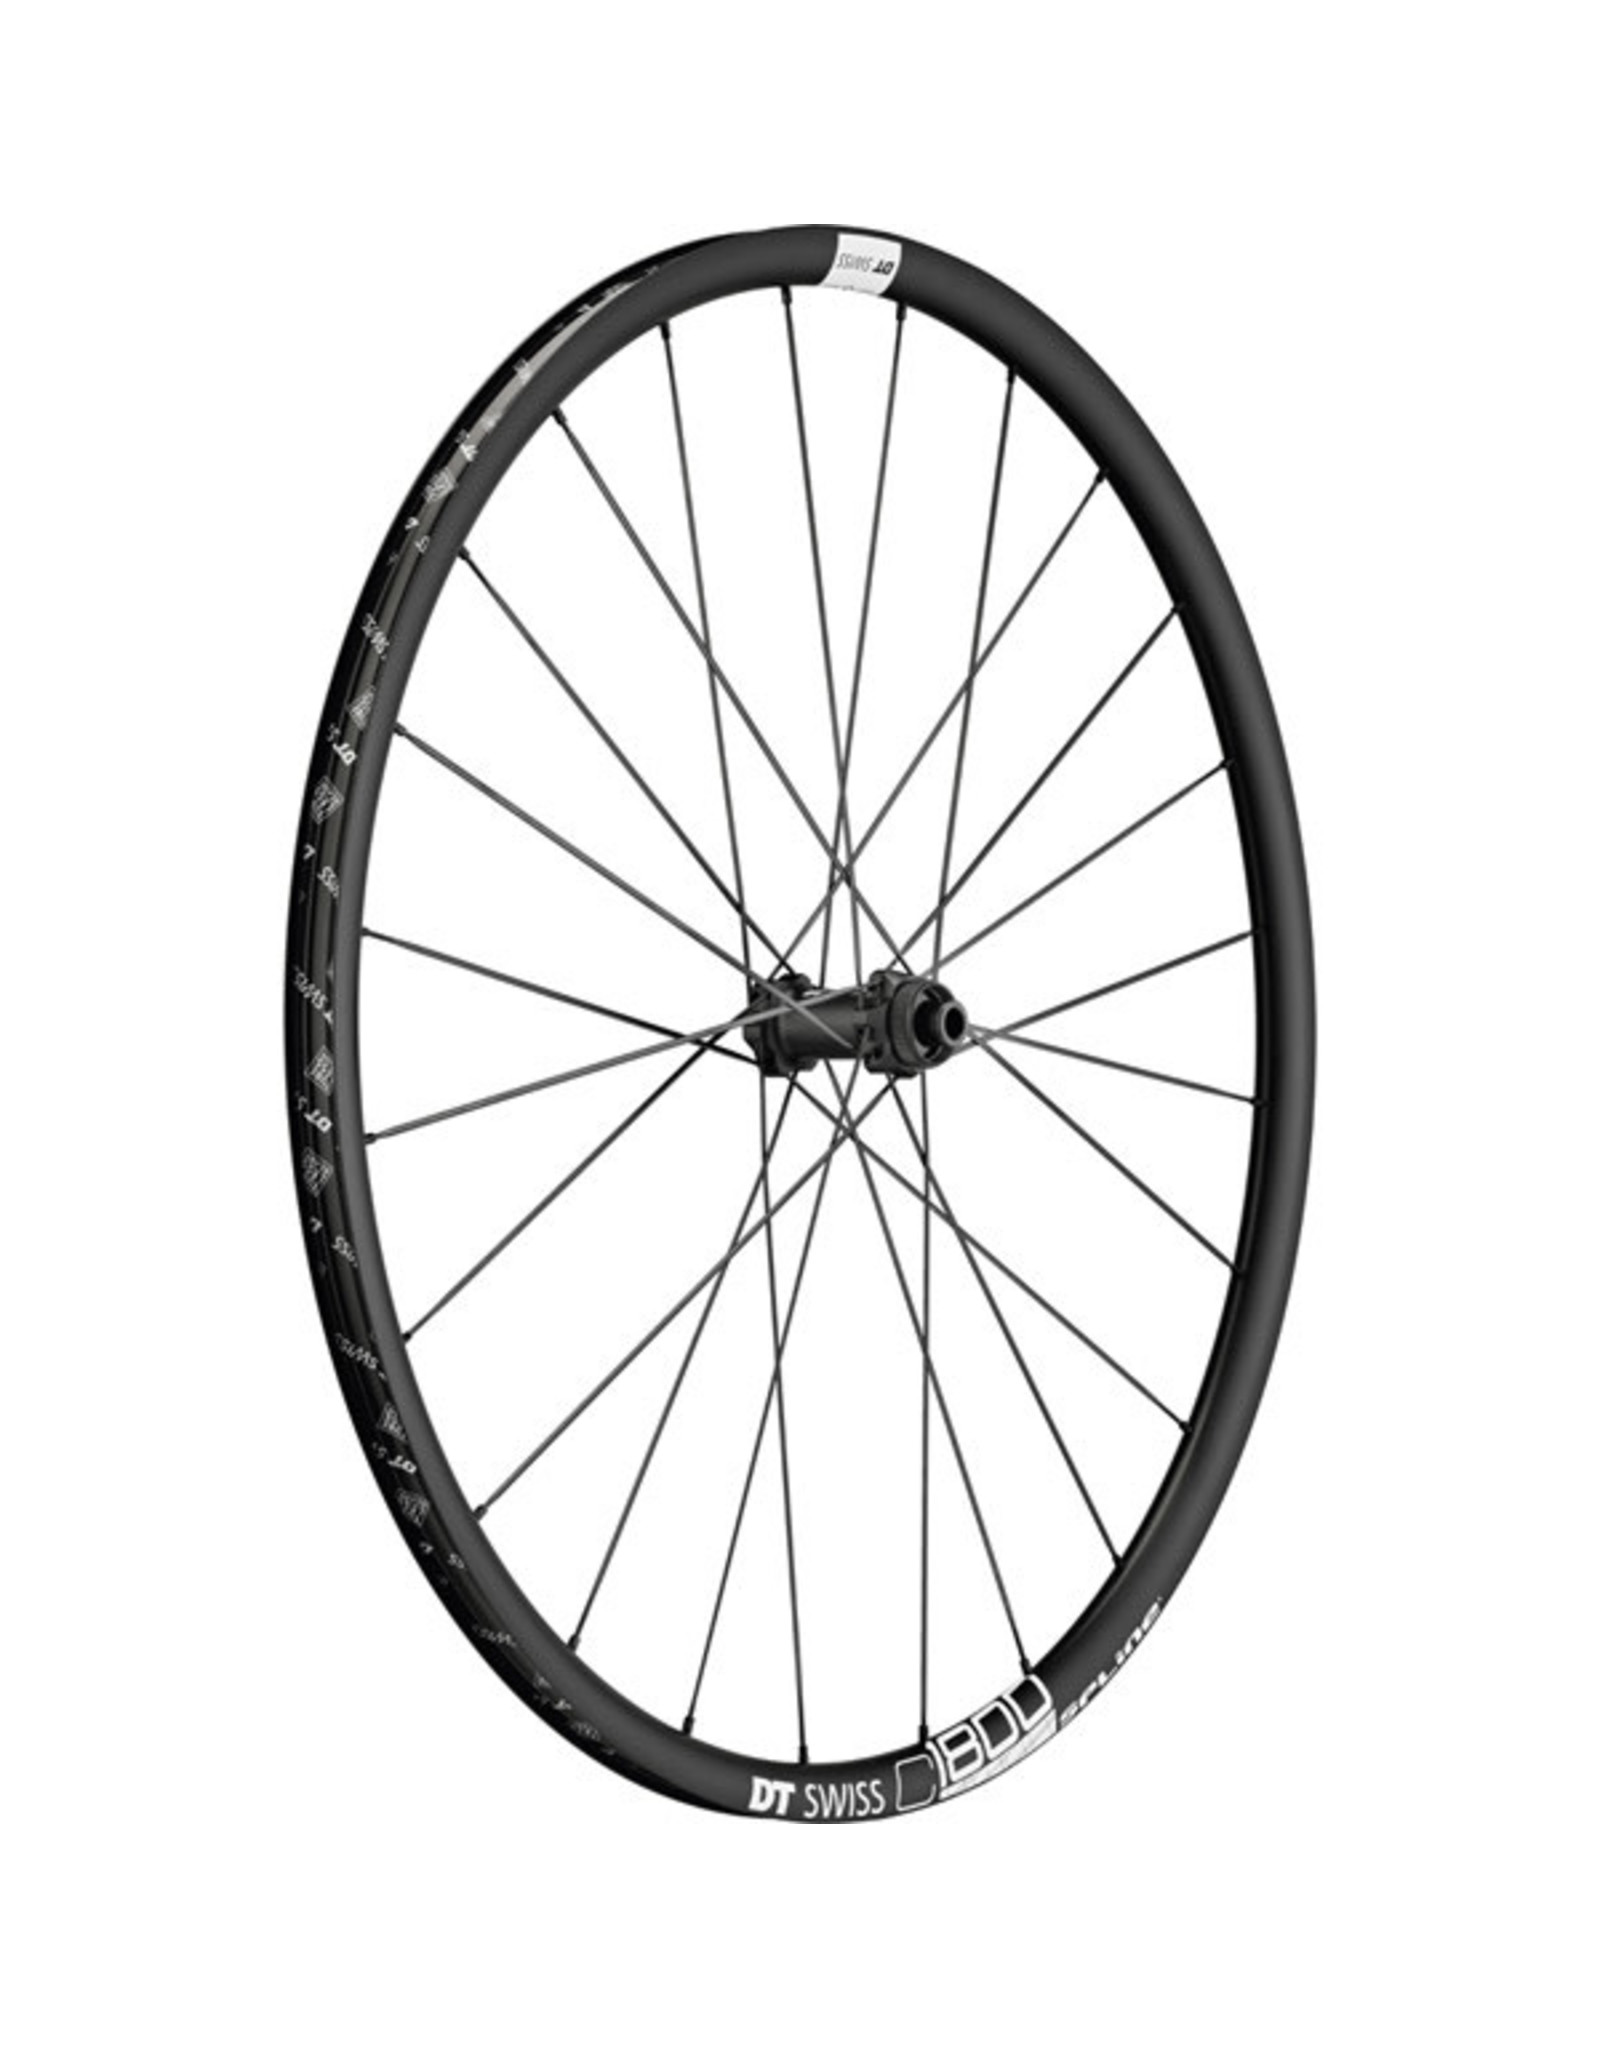 DT Swiss Wheel Disc Brake C 1800